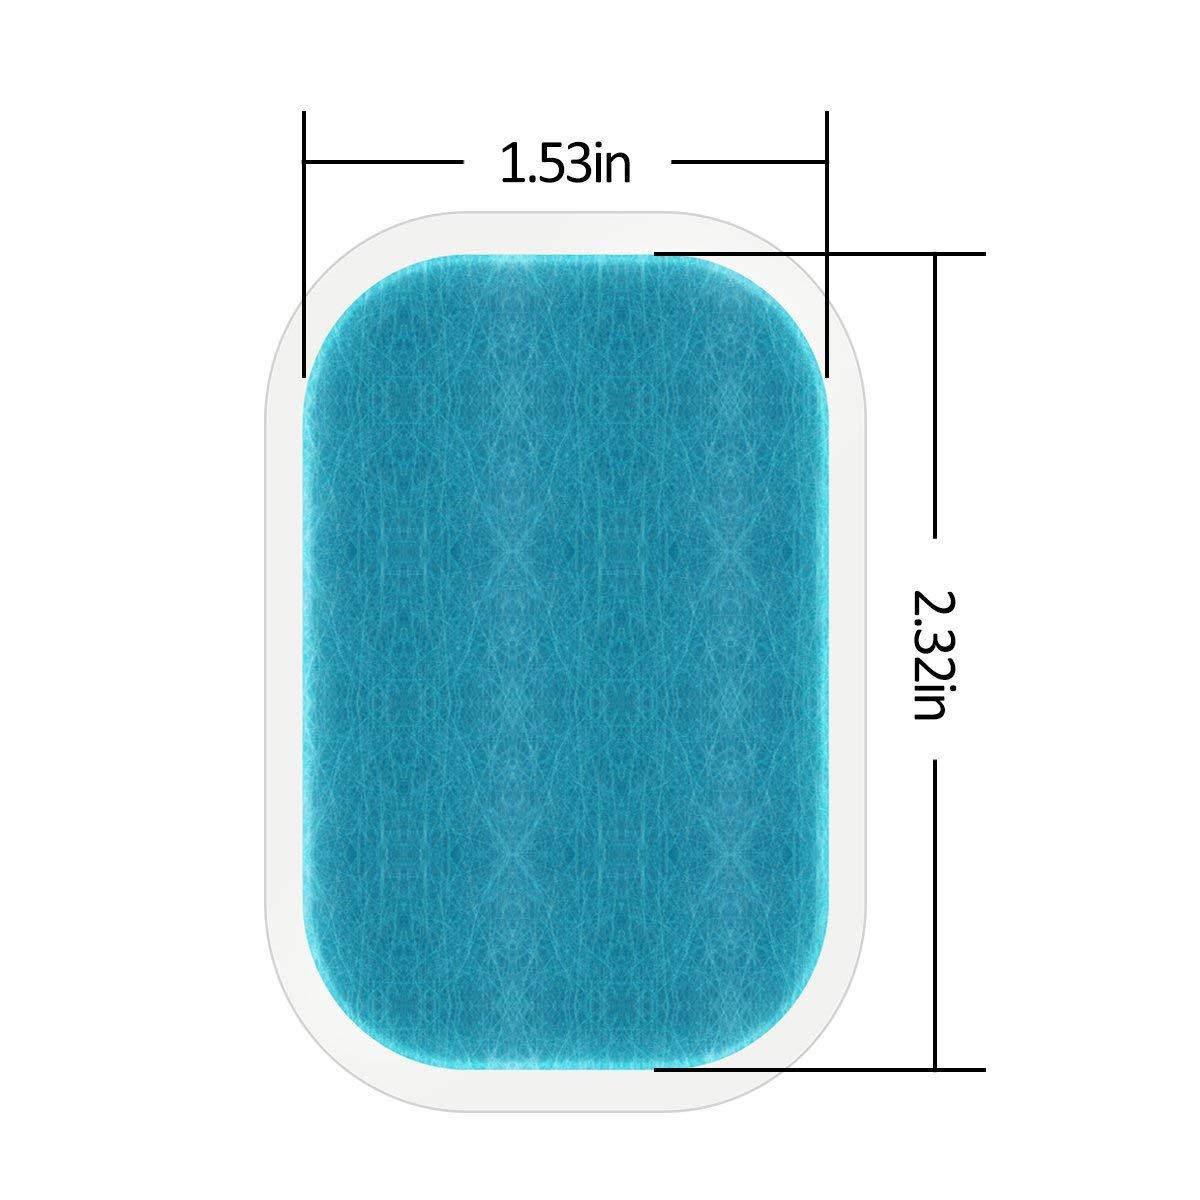 PINCHUANG 30 Pcs//15 Packs Abs Stimulator Training Replacement Gel Sheet Pads for Muscle Toner Abdominal Workout Belt